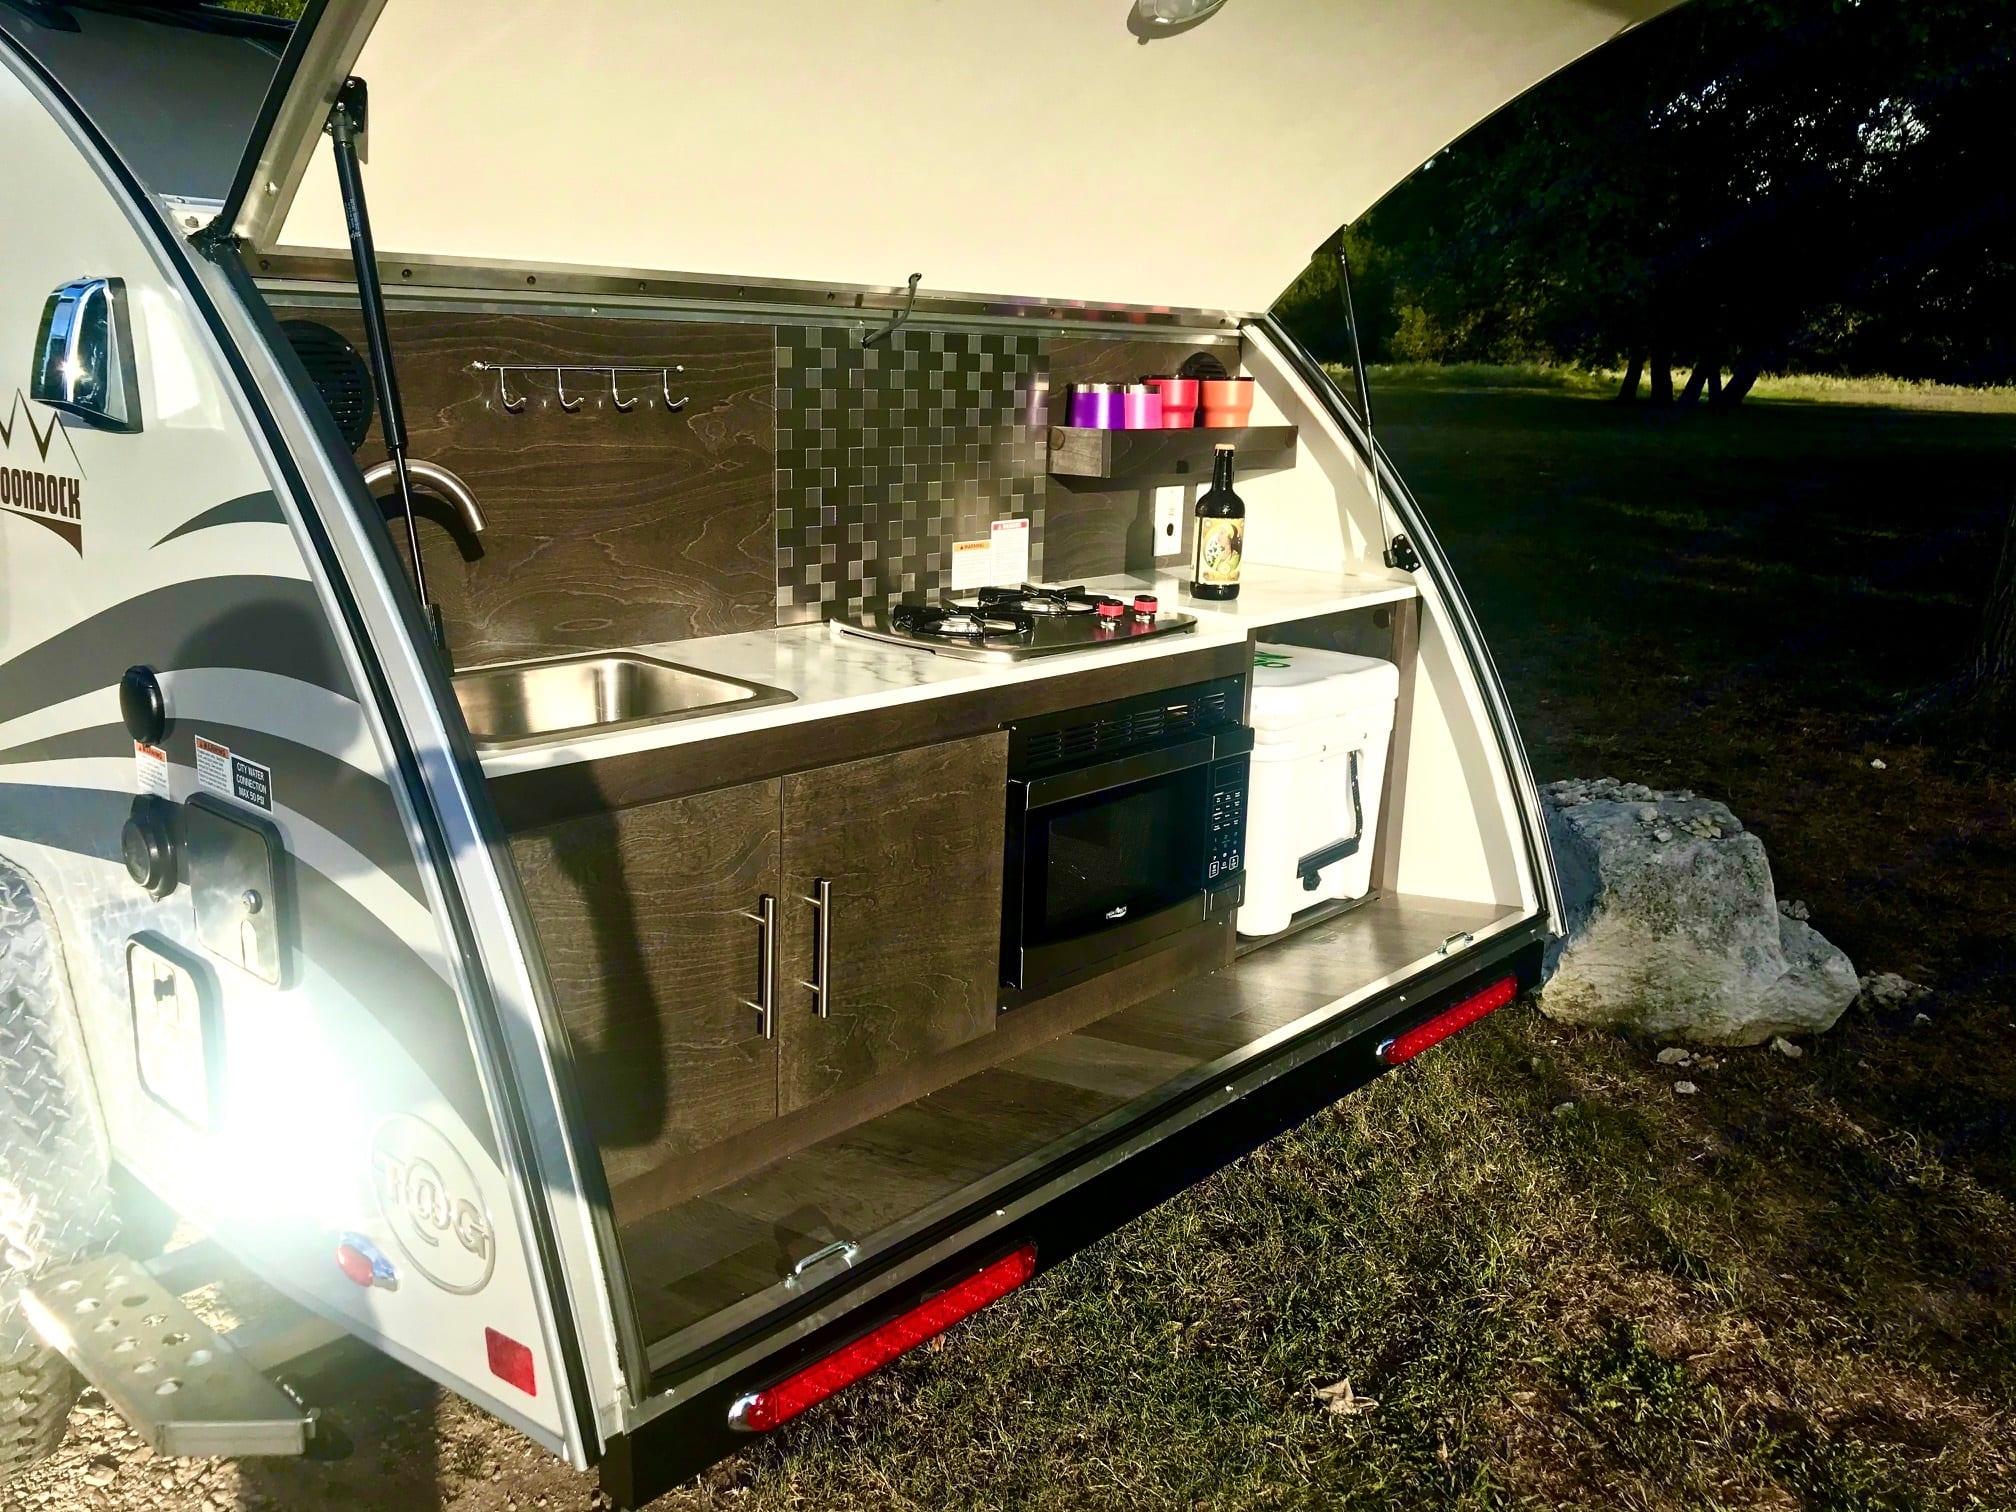 Full kitchen.. Nucamp T@G XL Boondock 2021